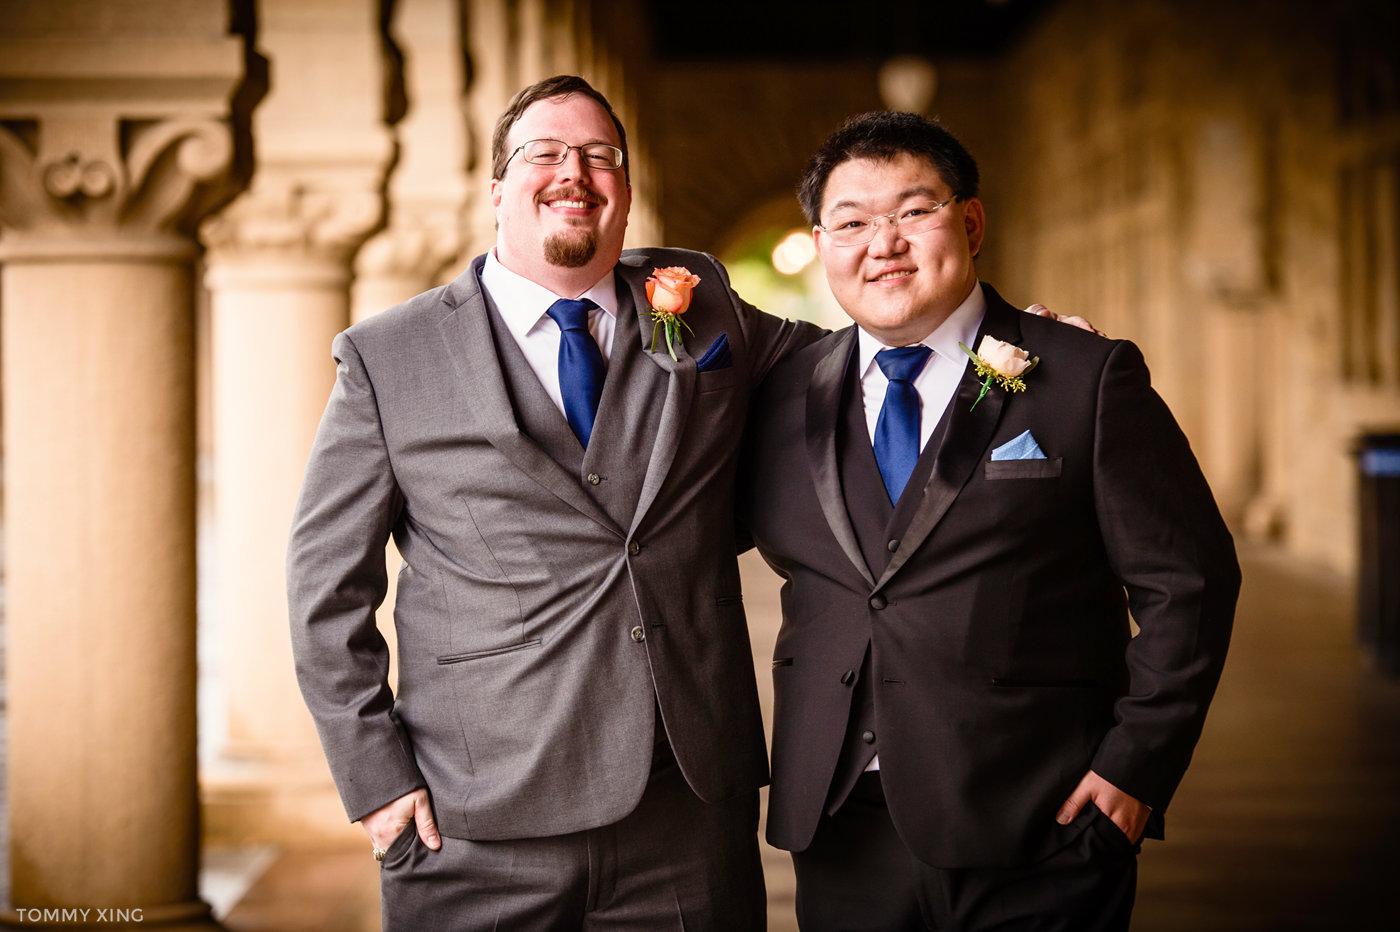 STANFORD MEMORIAL CHURCH WEDDING - Wenjie & Chengcheng - SAN FRANCISCO BAY AREA 斯坦福教堂婚礼跟拍 - 洛杉矶婚礼婚纱照摄影师 Tommy Xing Photography140.jpg